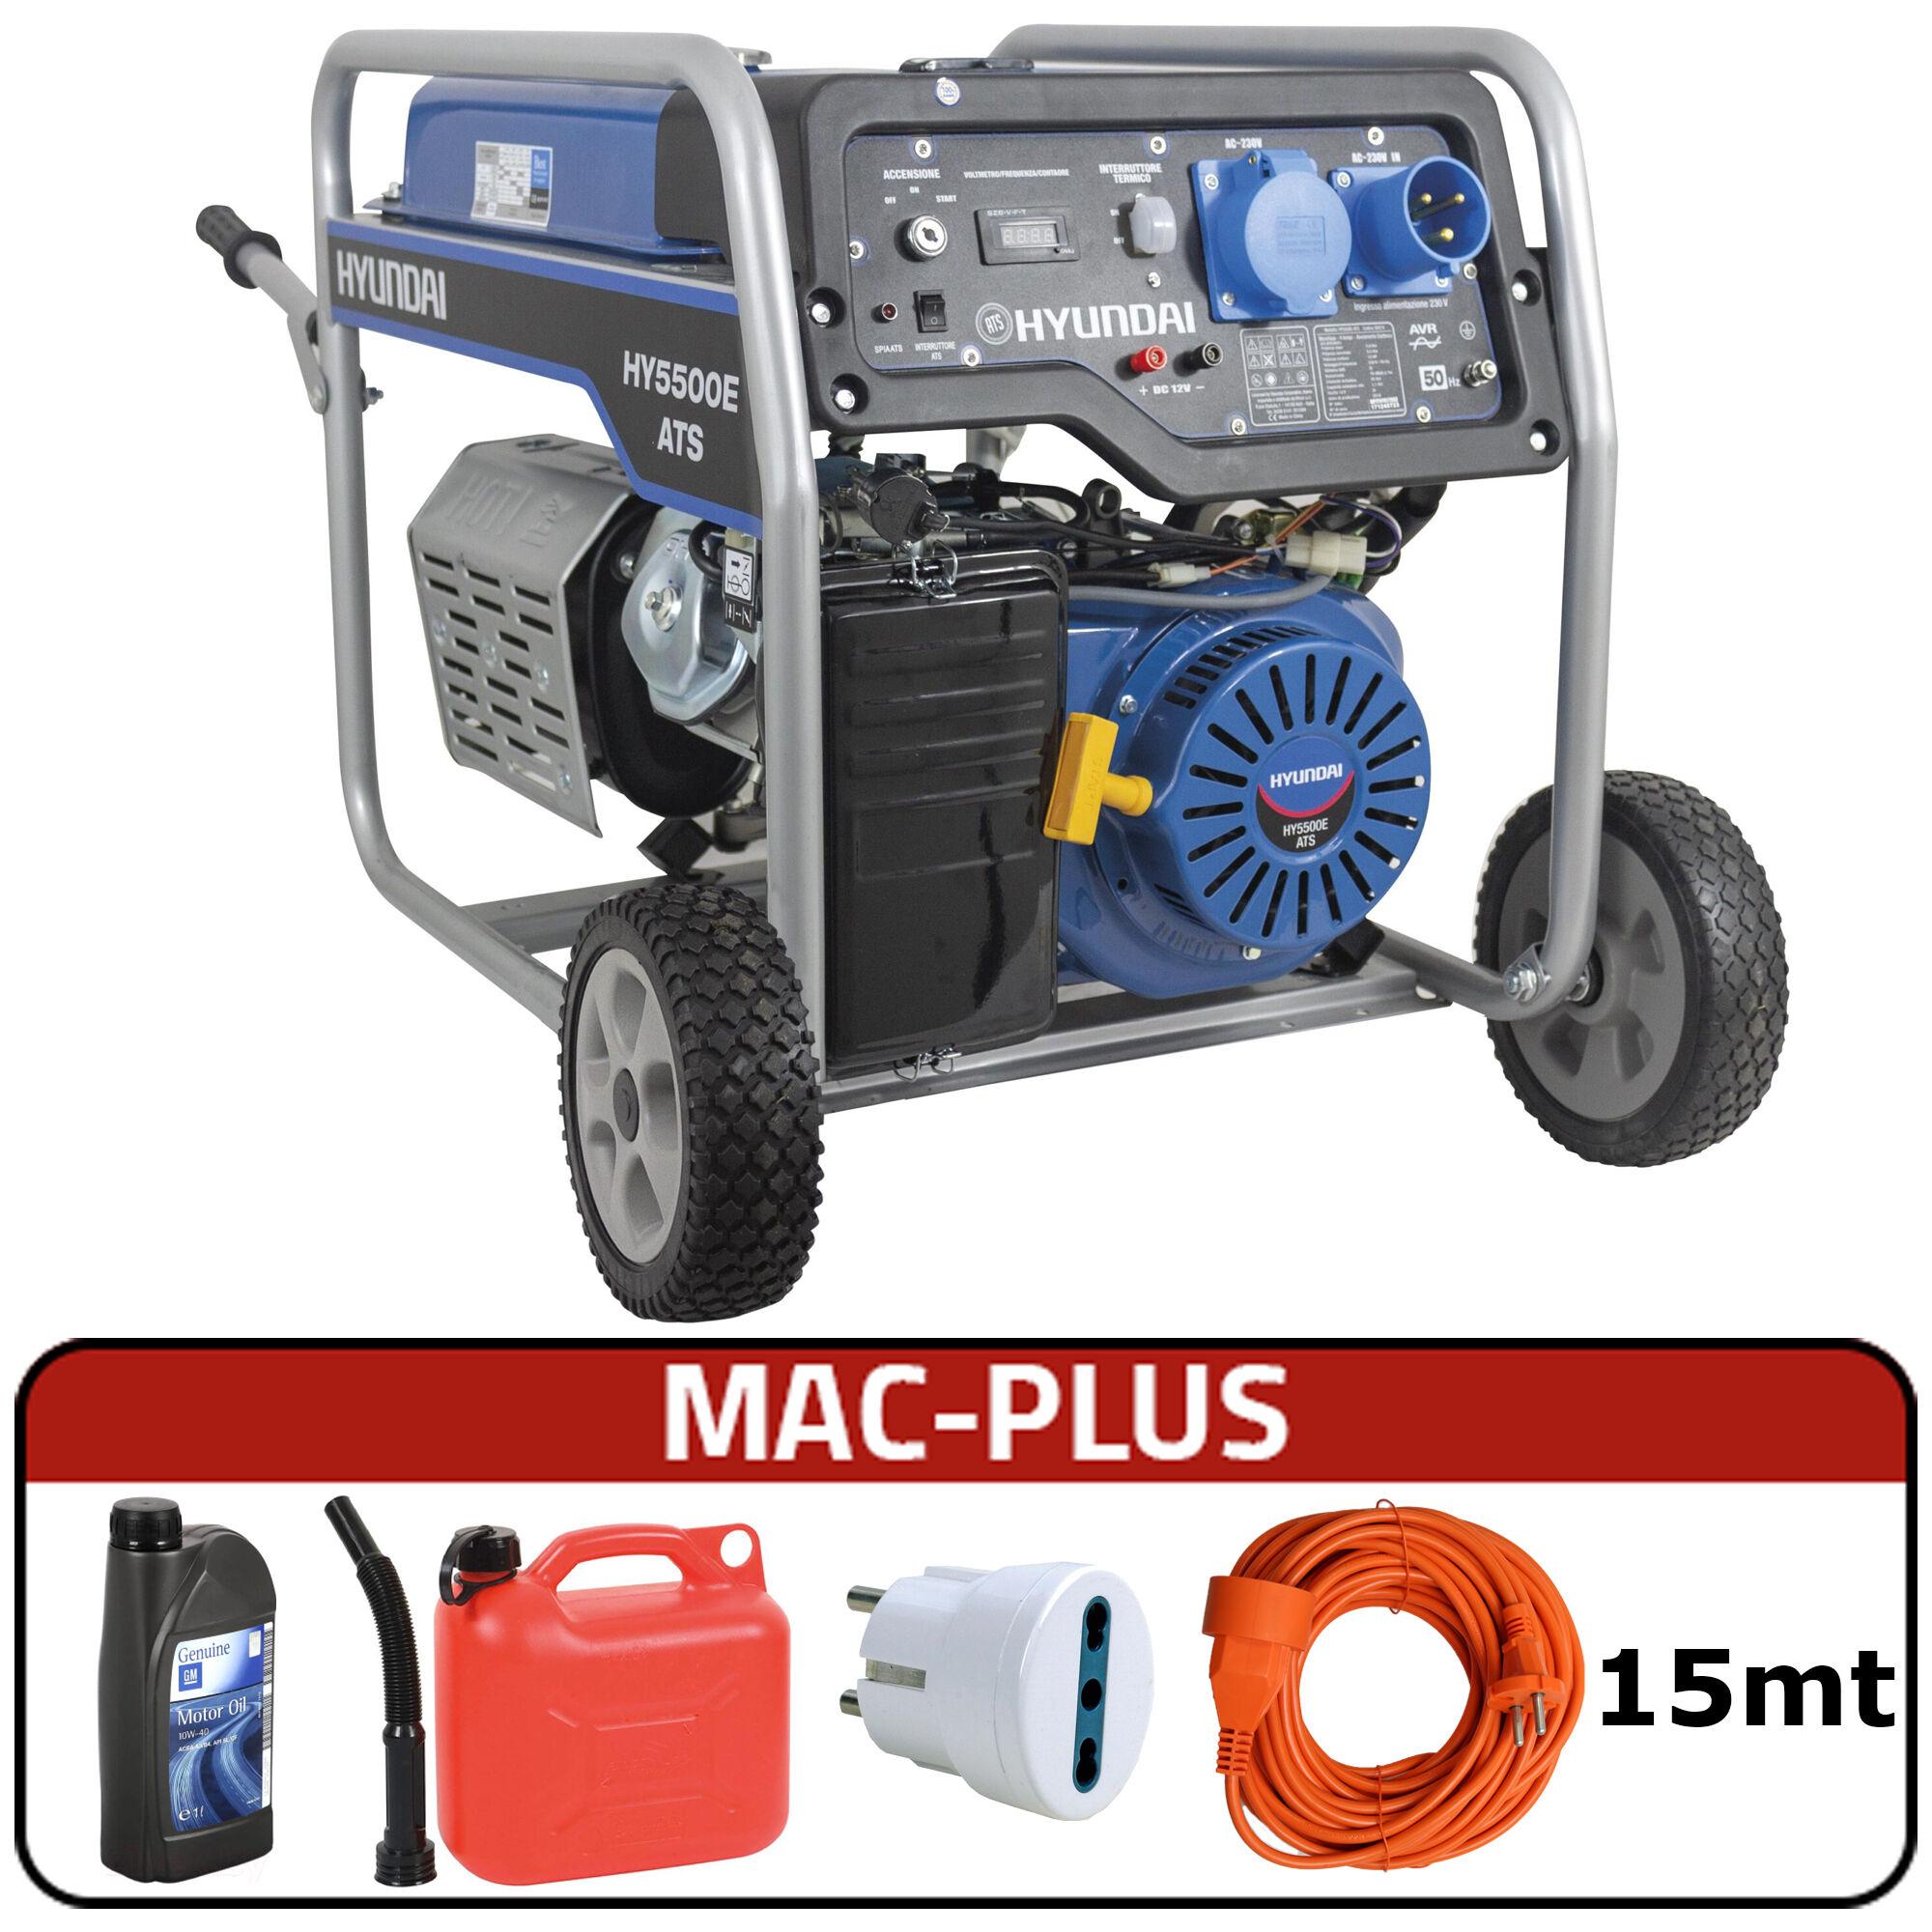 hyundai generatore di corrente hyundai 65014 hy5500e ats con avr + mac-plus